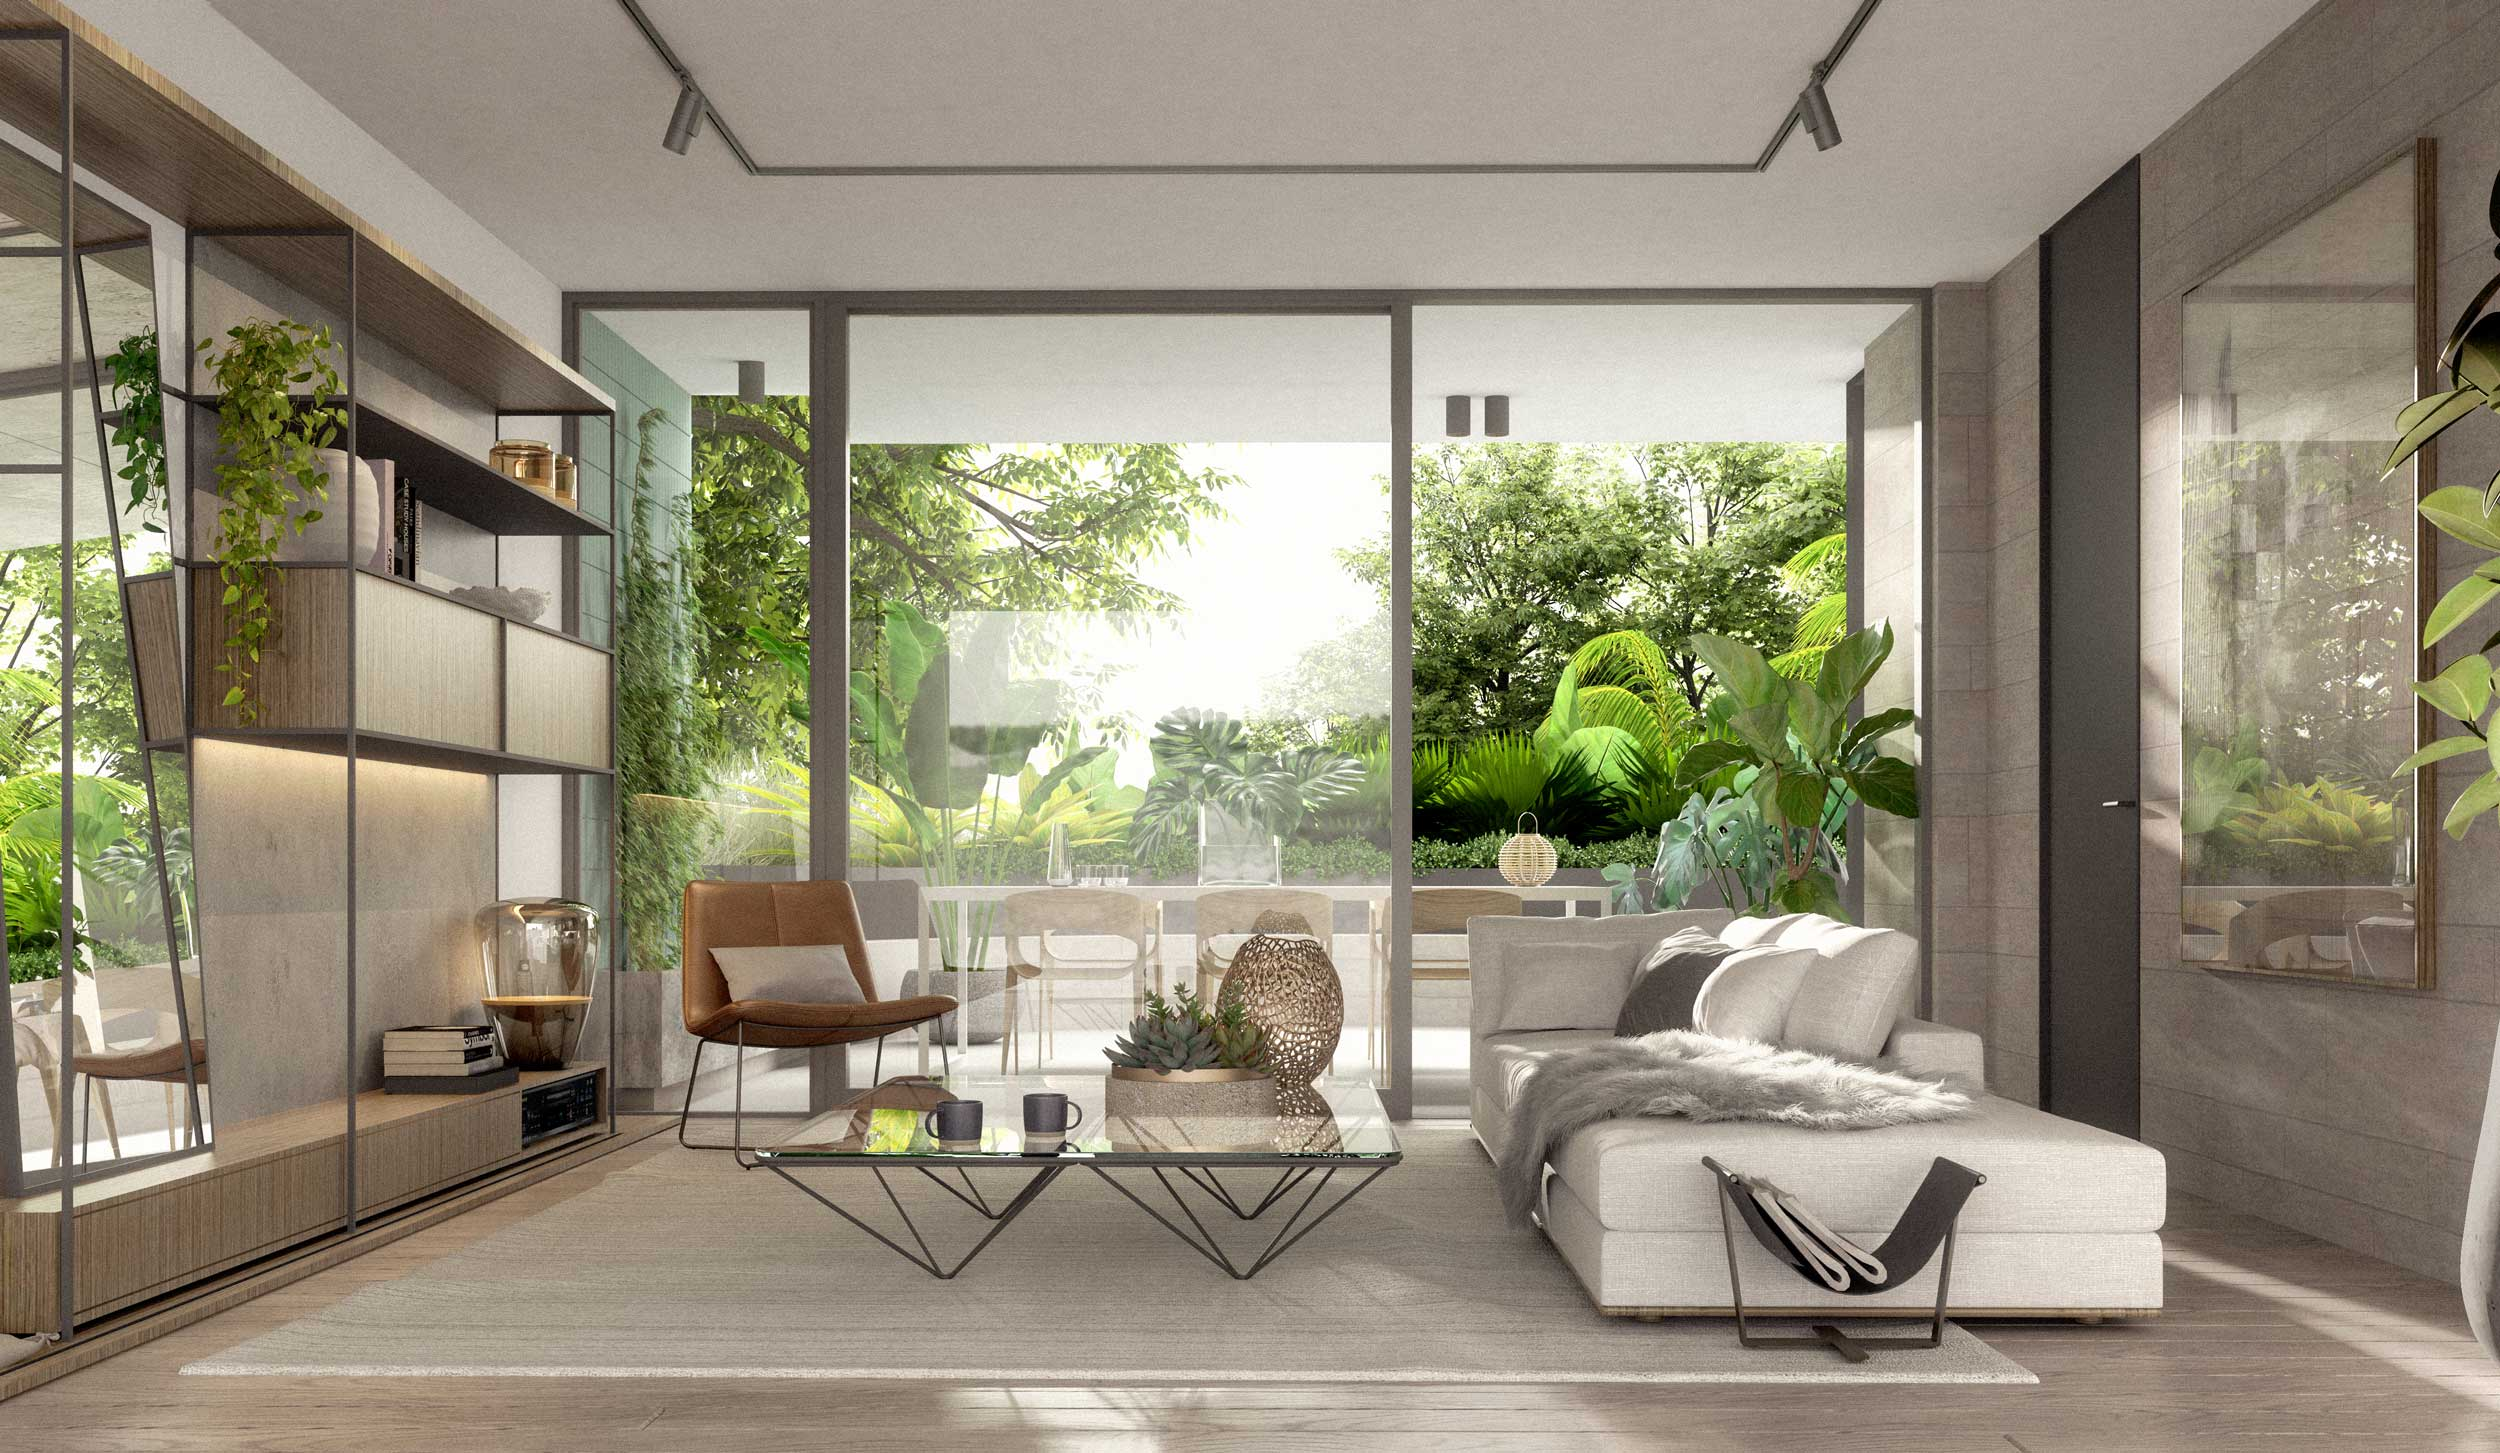 Courtyard-Apartment-Living-room-redo.jpg